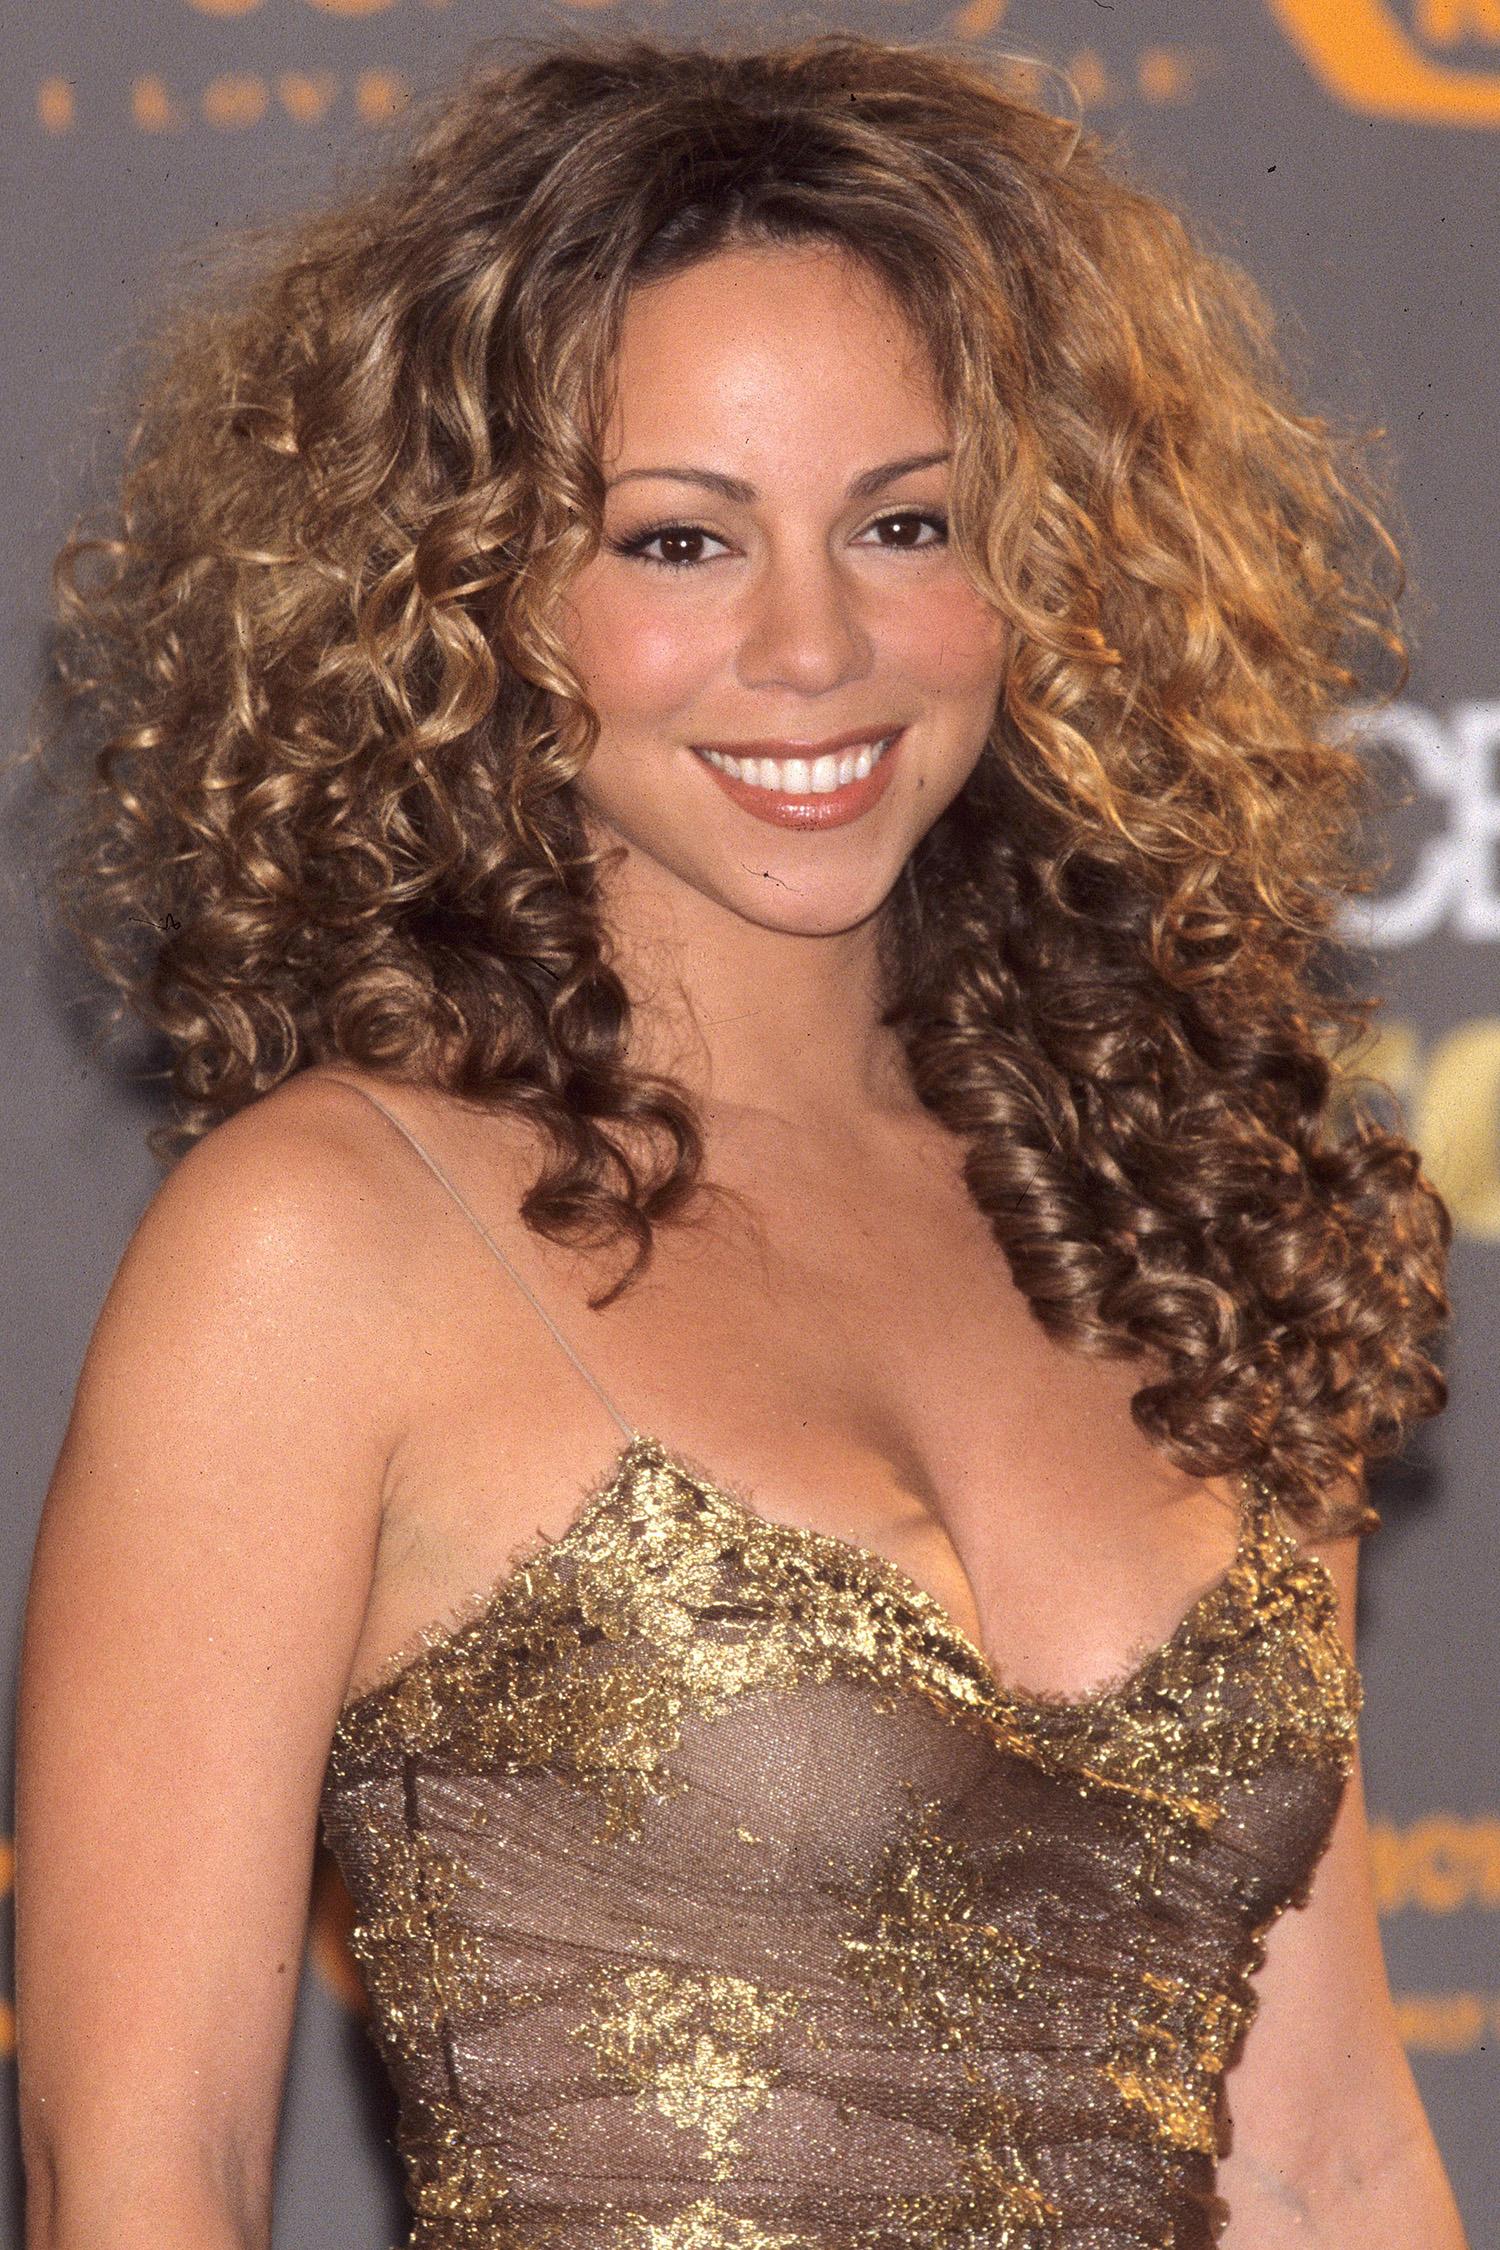 Iconic diva hair big diva hair moments - Mariah carey diva ...